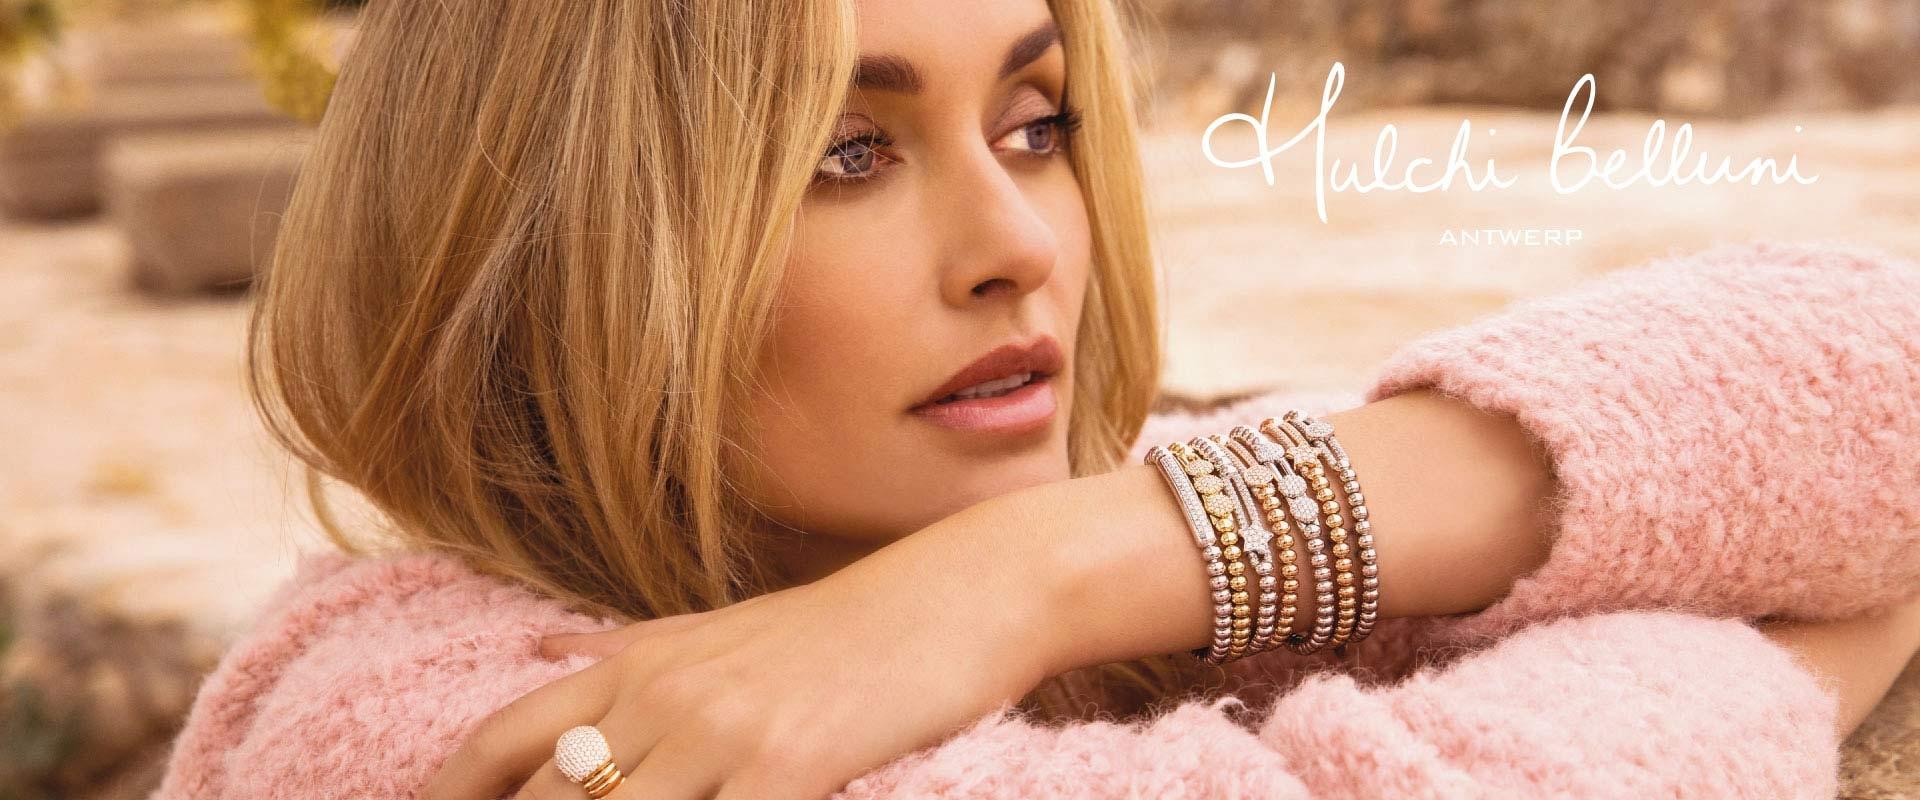 Deutsch Fine Jewelry (@deutschfinejewelry) Cover Image